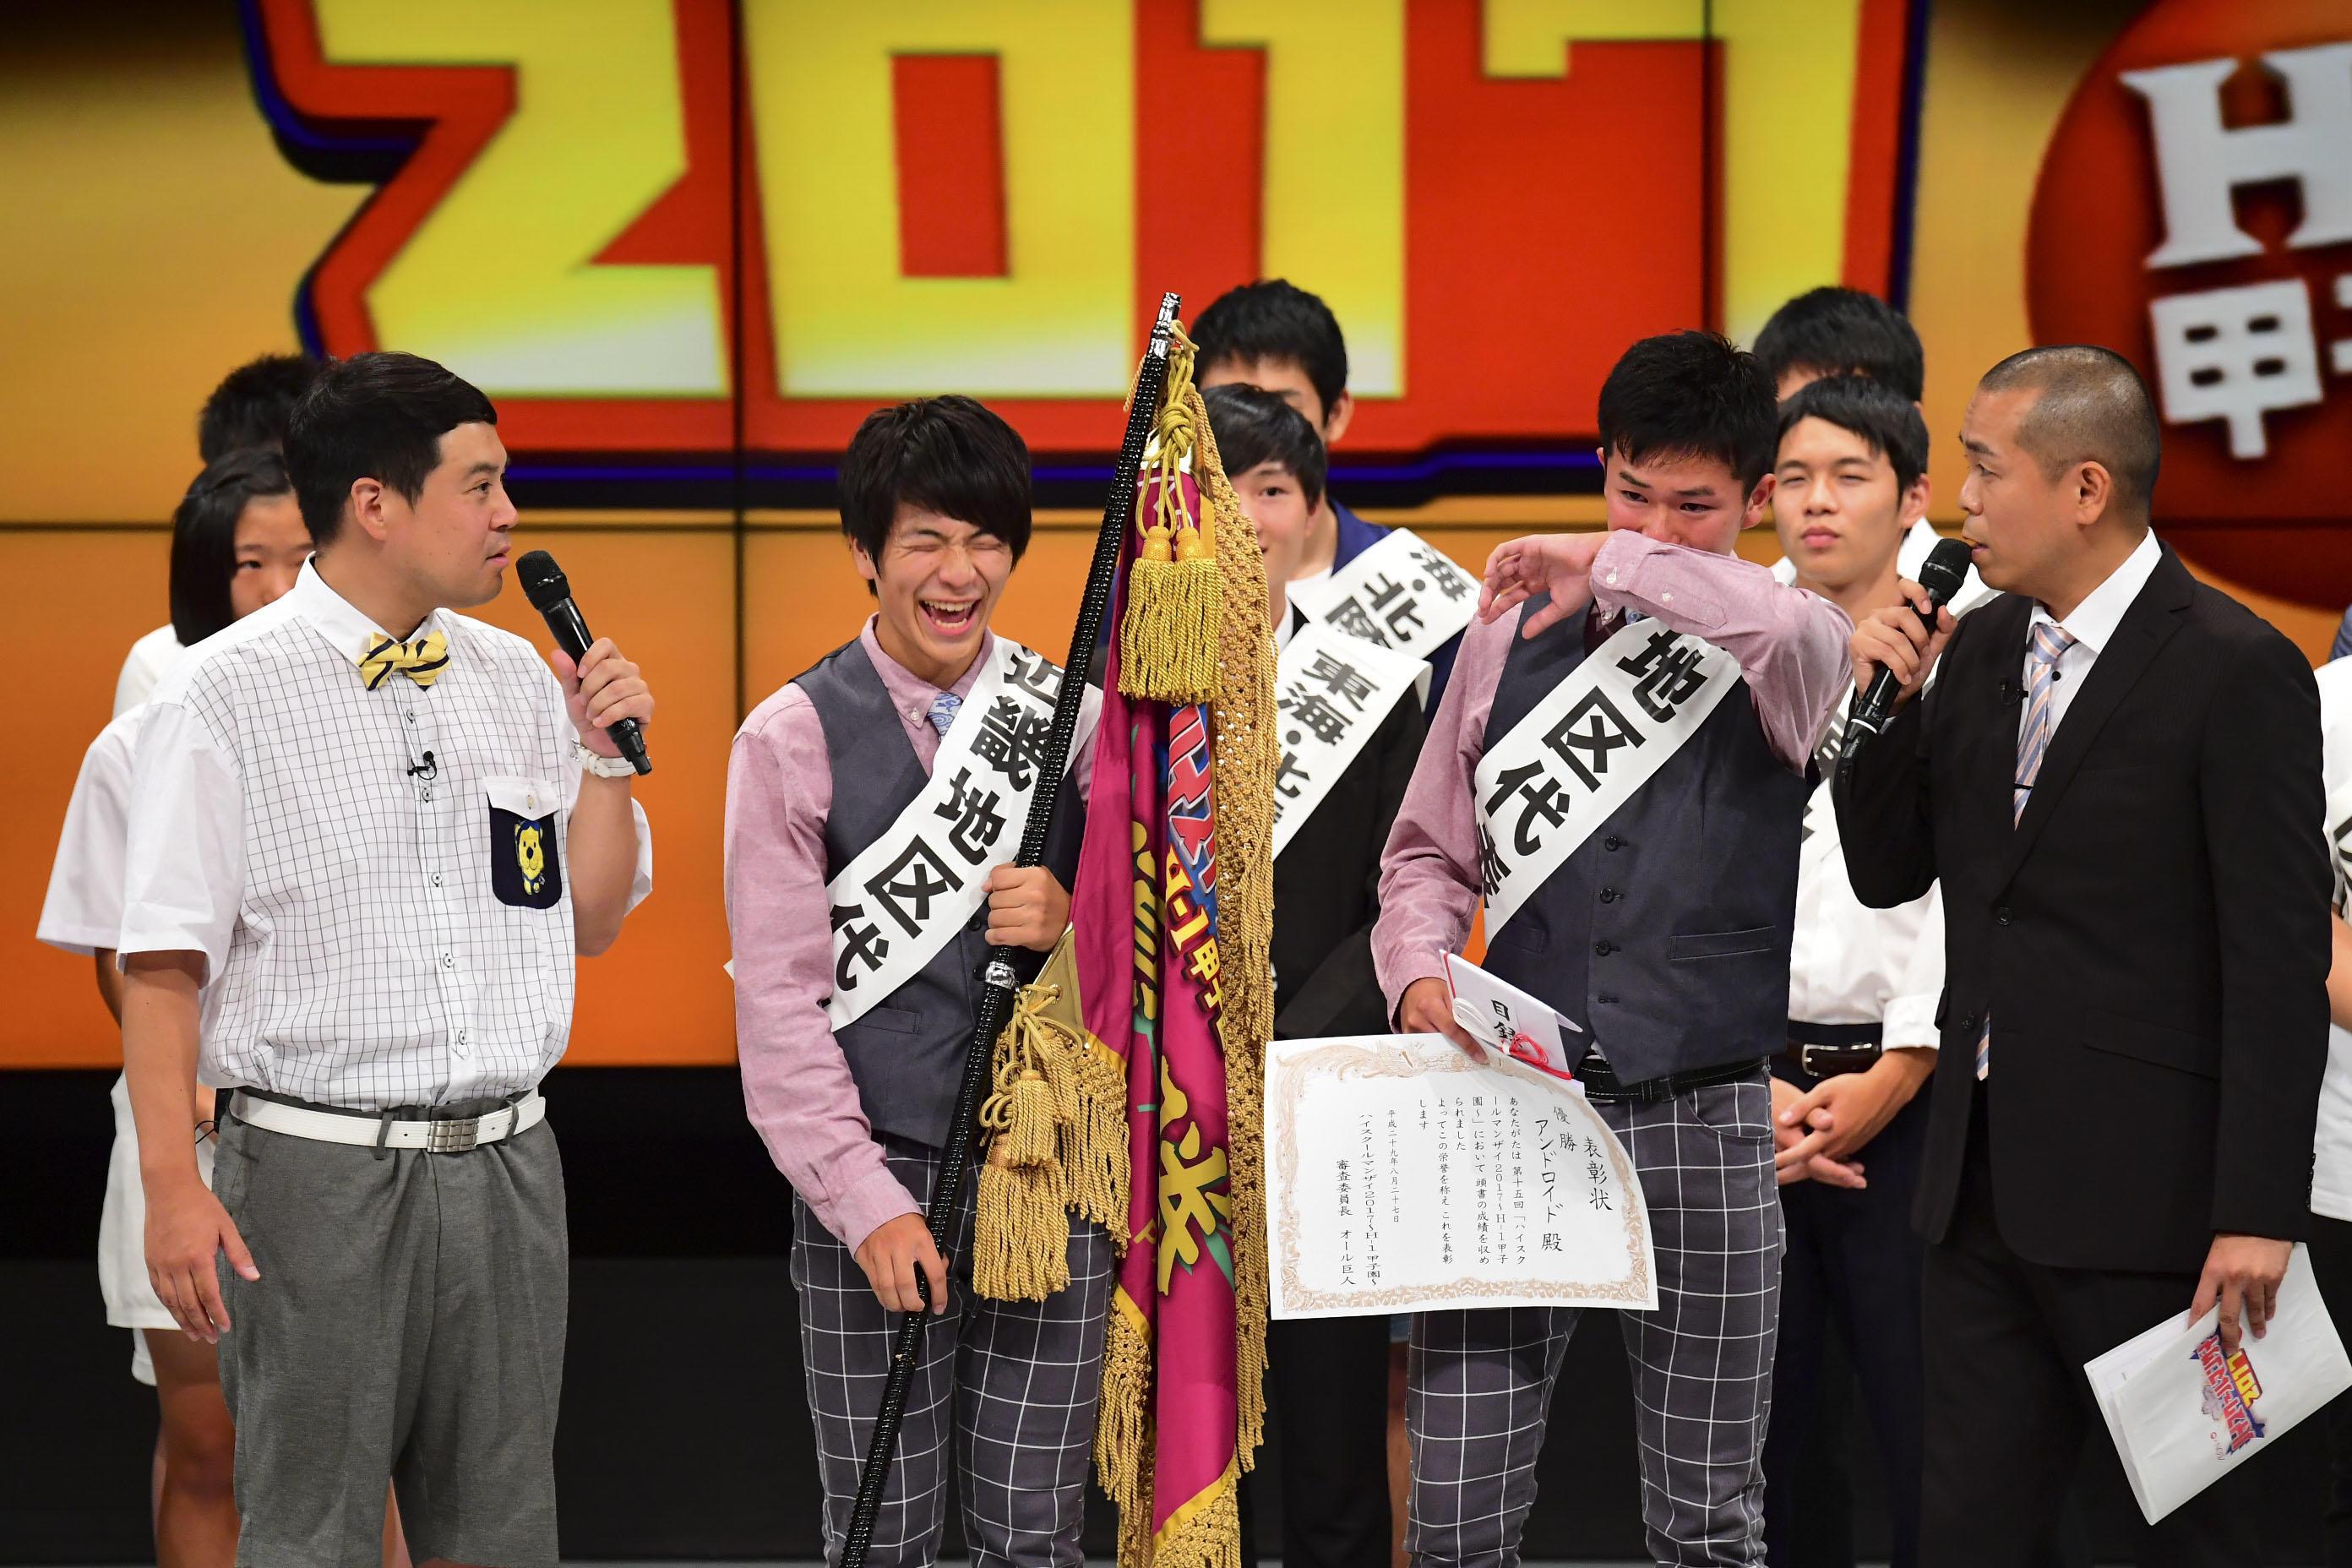 http://news.yoshimoto.co.jp/20170830150140-7f56b98444937b9a0eae7e9134a37d1d6f8674a1.jpg